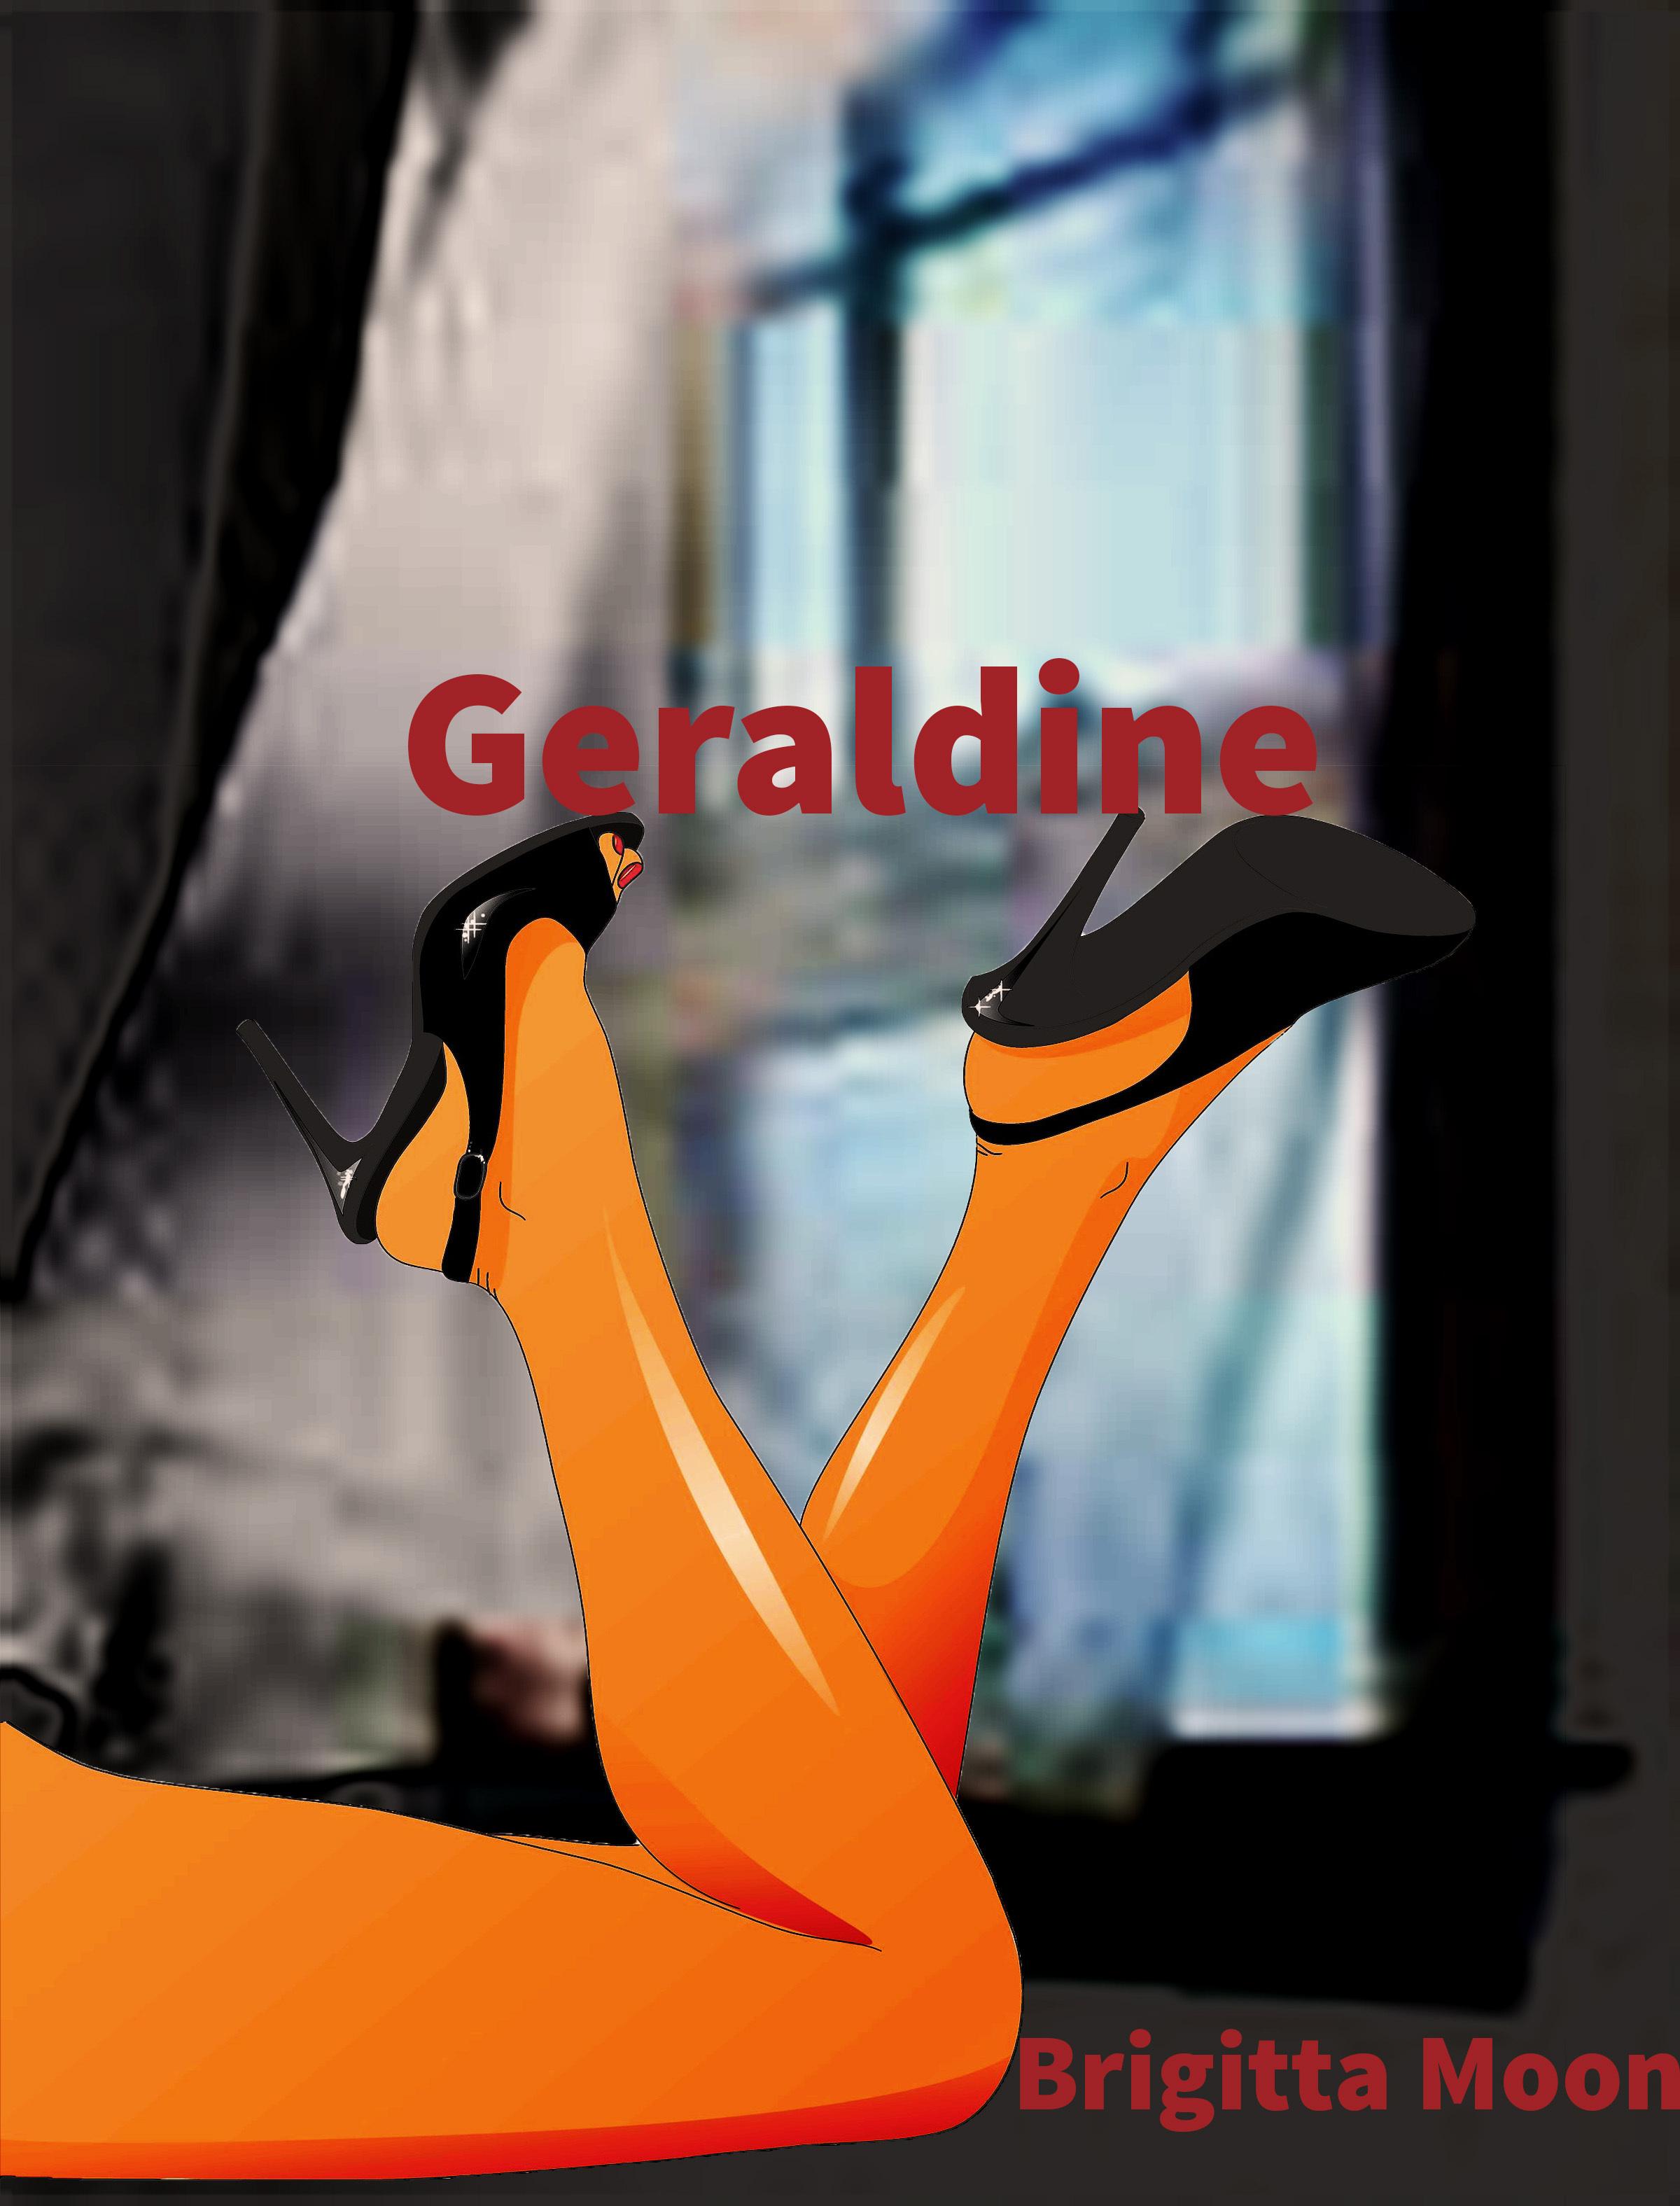 Geraldine Brigitta Moon